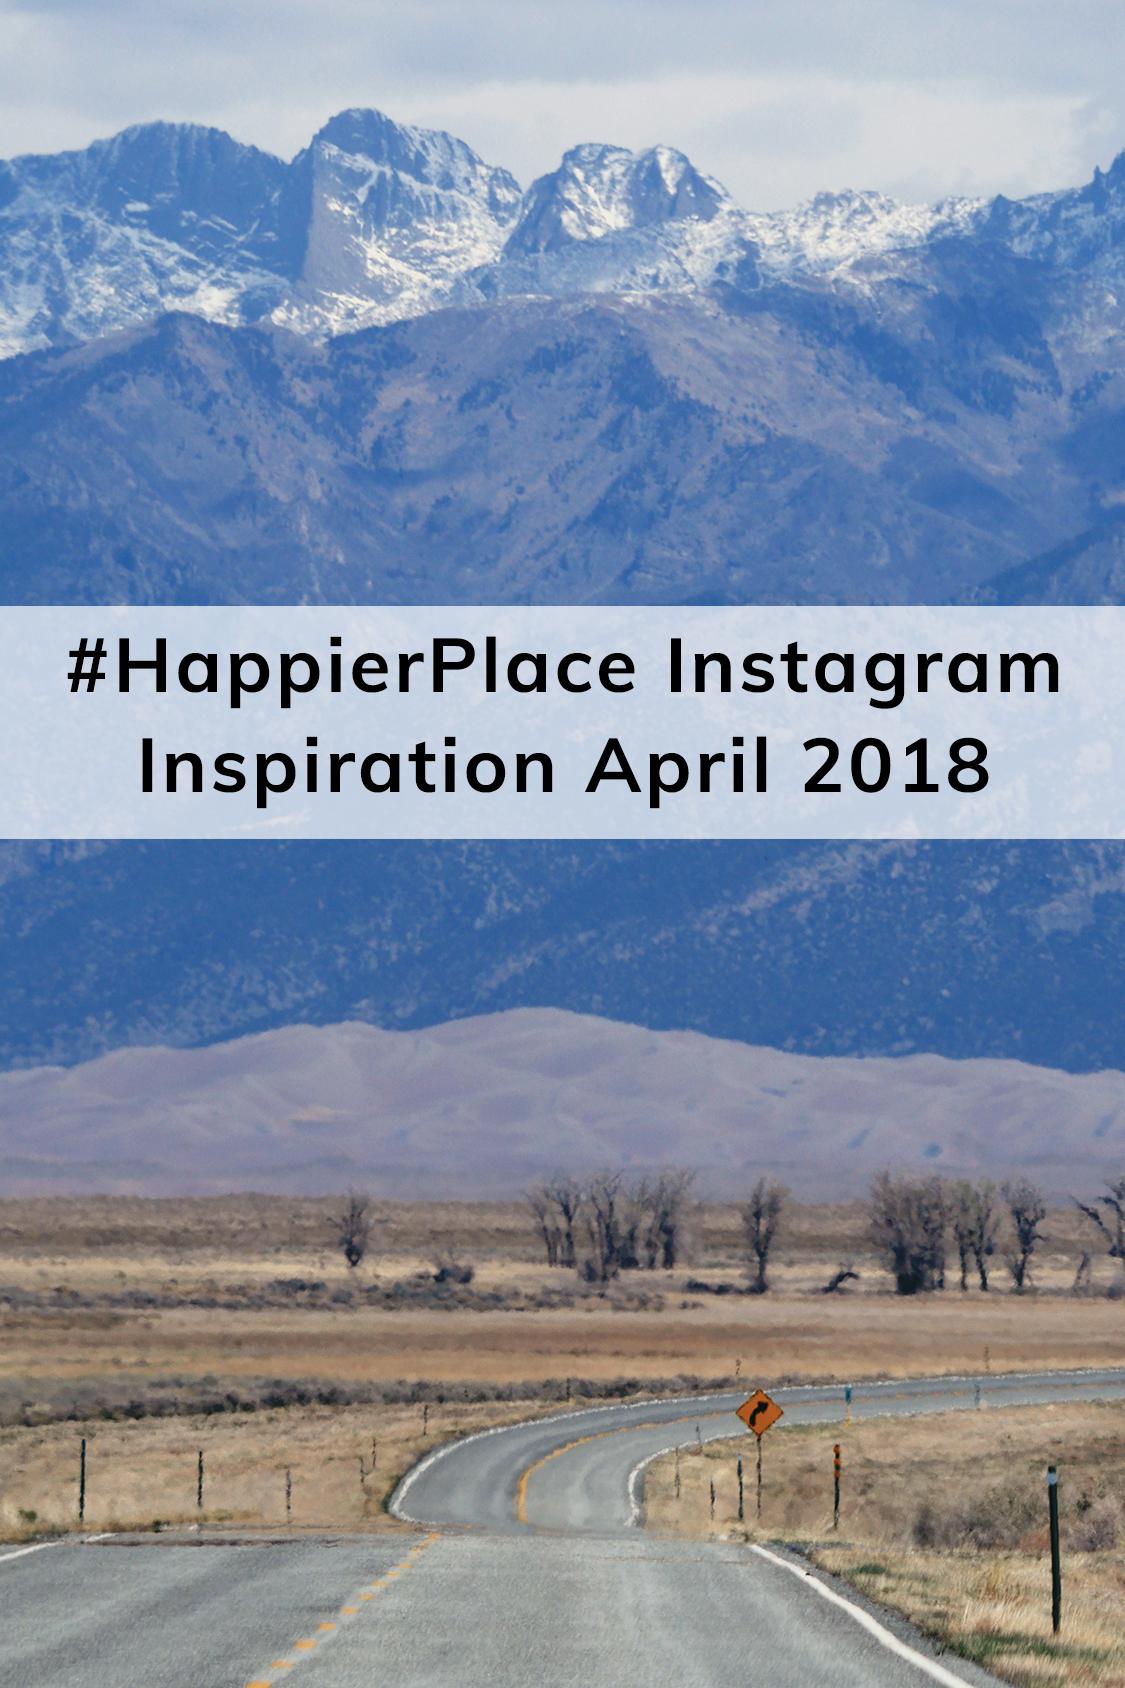 #HappierPlace Instagram Inspiration – April 2018